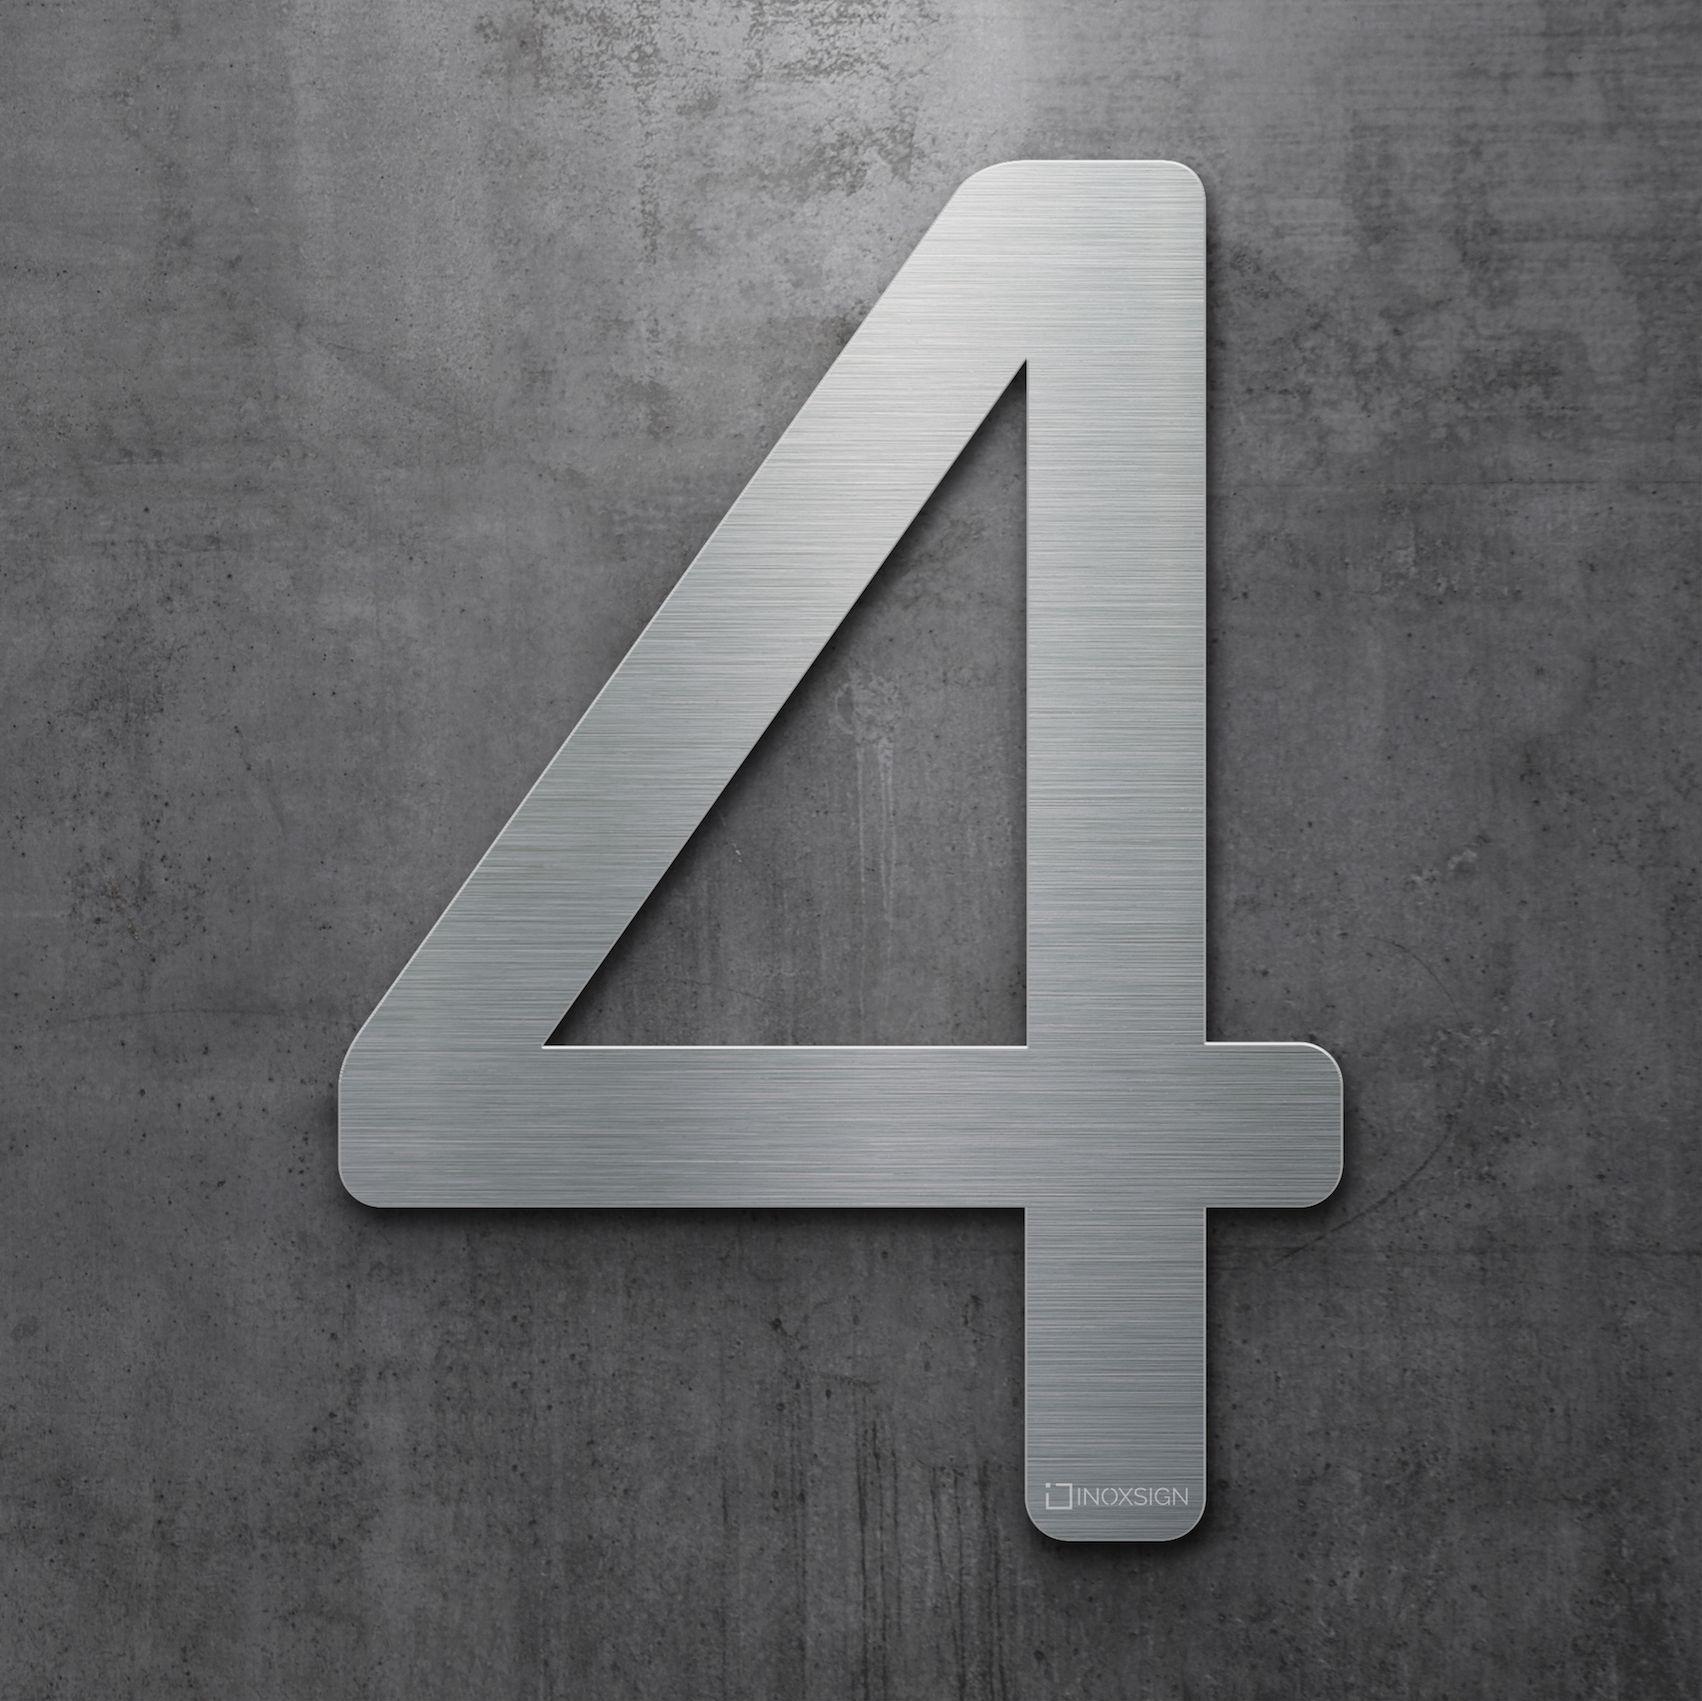 neu inoxsign edelstahl hausnummer 4 moderne hausnummern aus